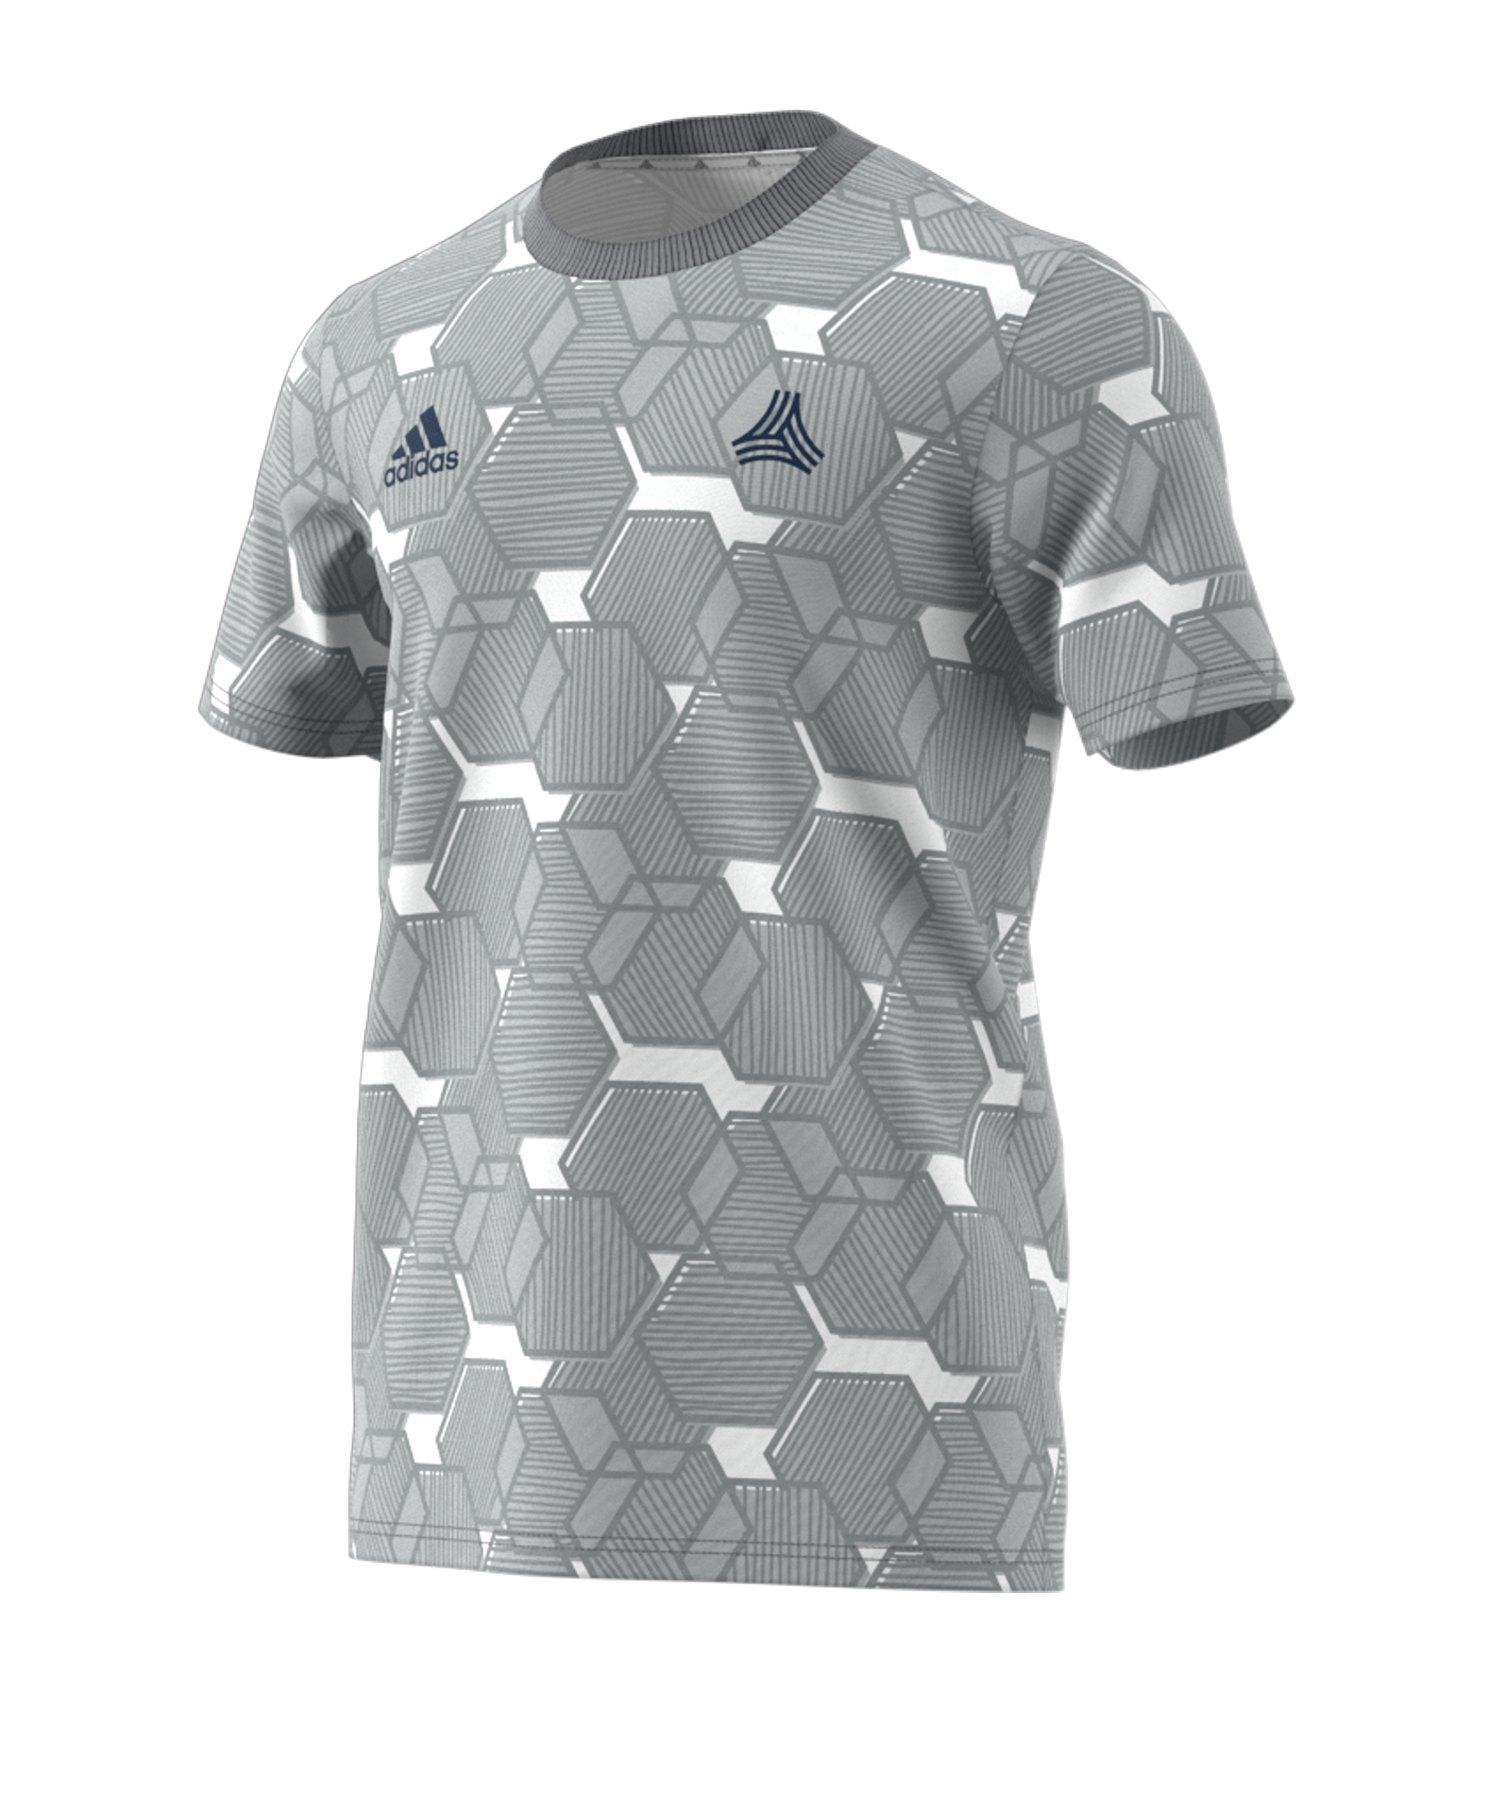 adidas Tango AOP T-Shirt Grau Weiss - grau